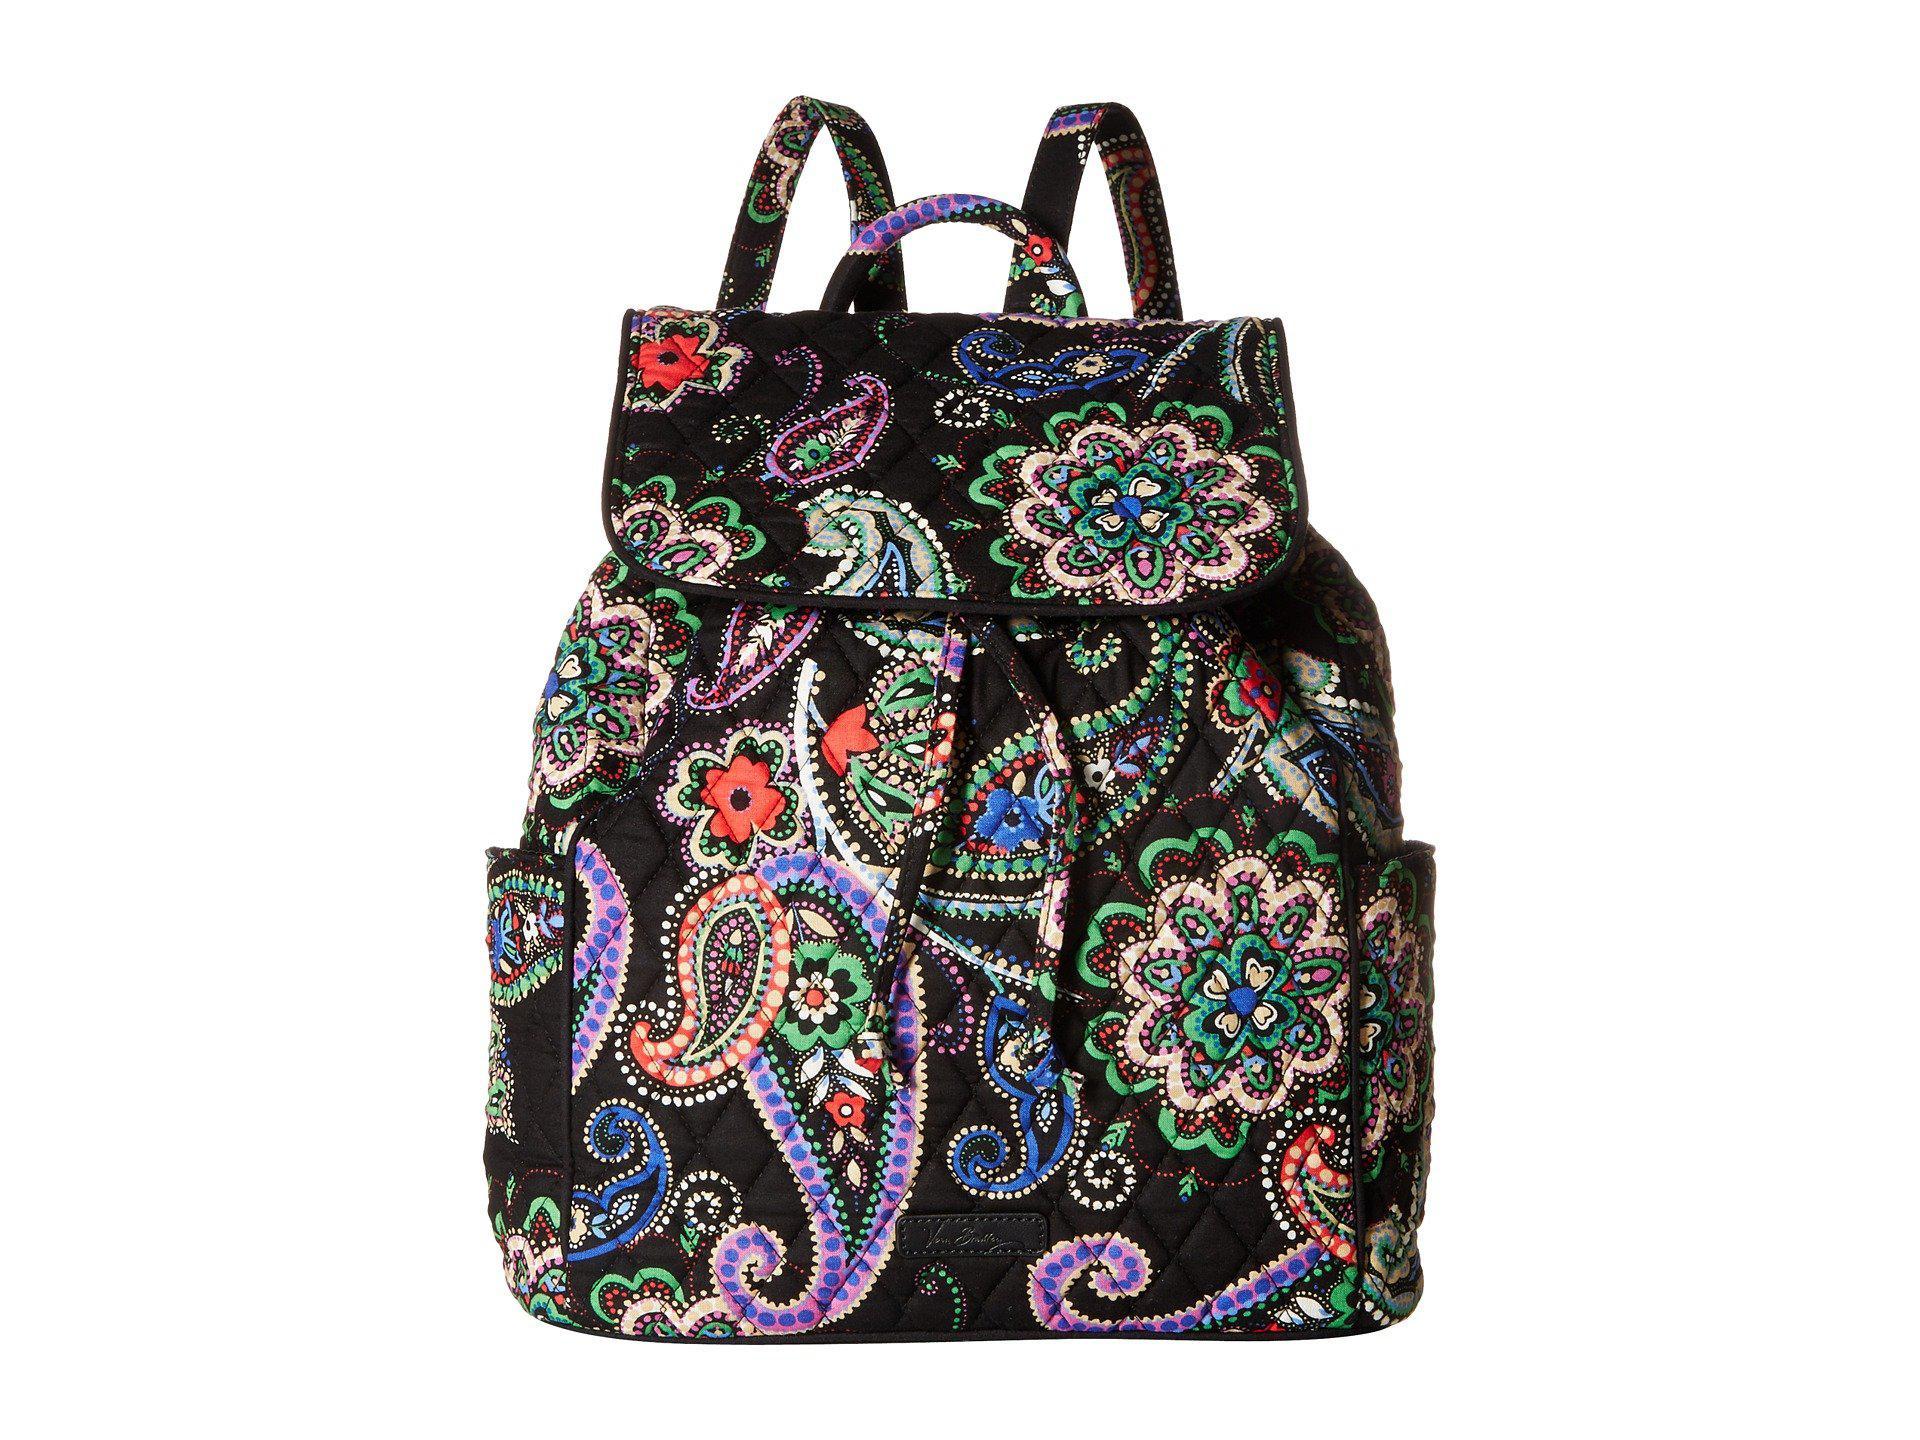 778079fb83 Lyst - Vera Bradley Drawstring Backpack in Black